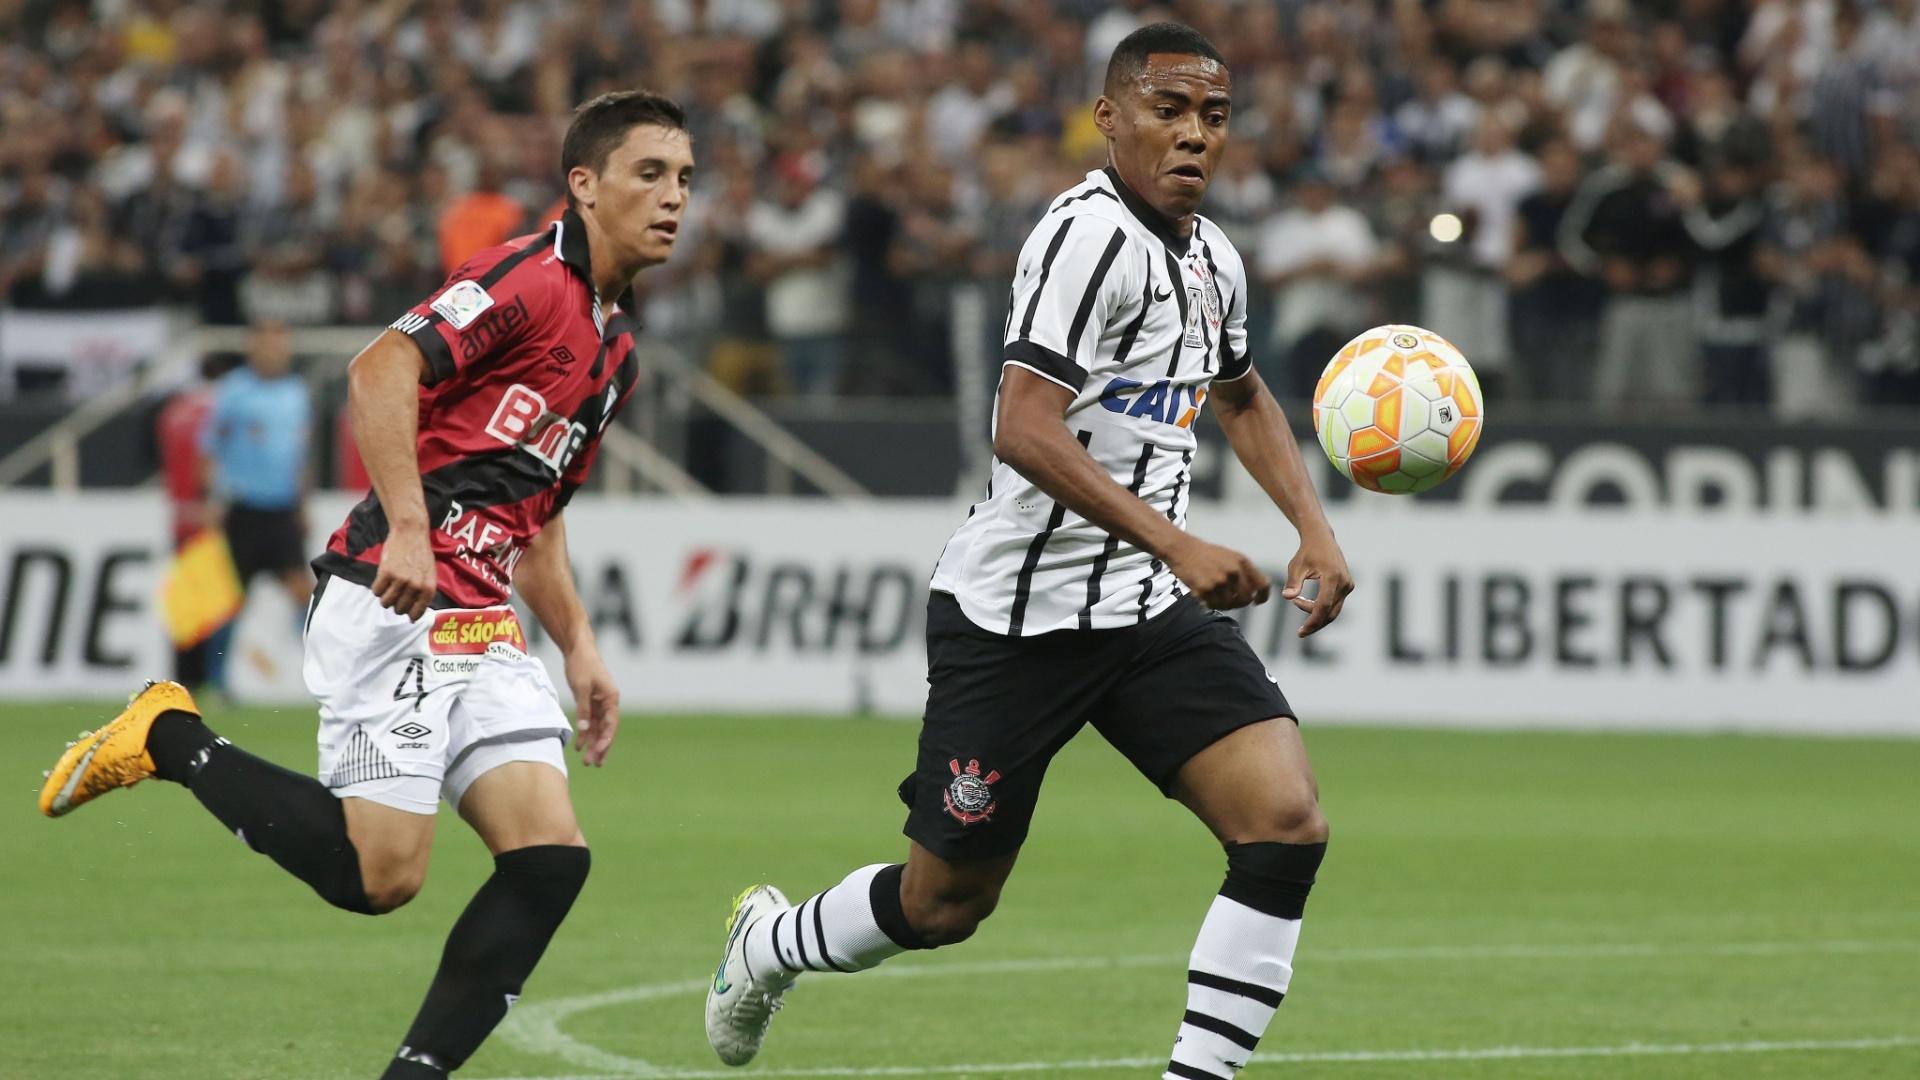 Elias foi vítima de racismo durante o jogo Corinthians e Danubio, pela Libertadores